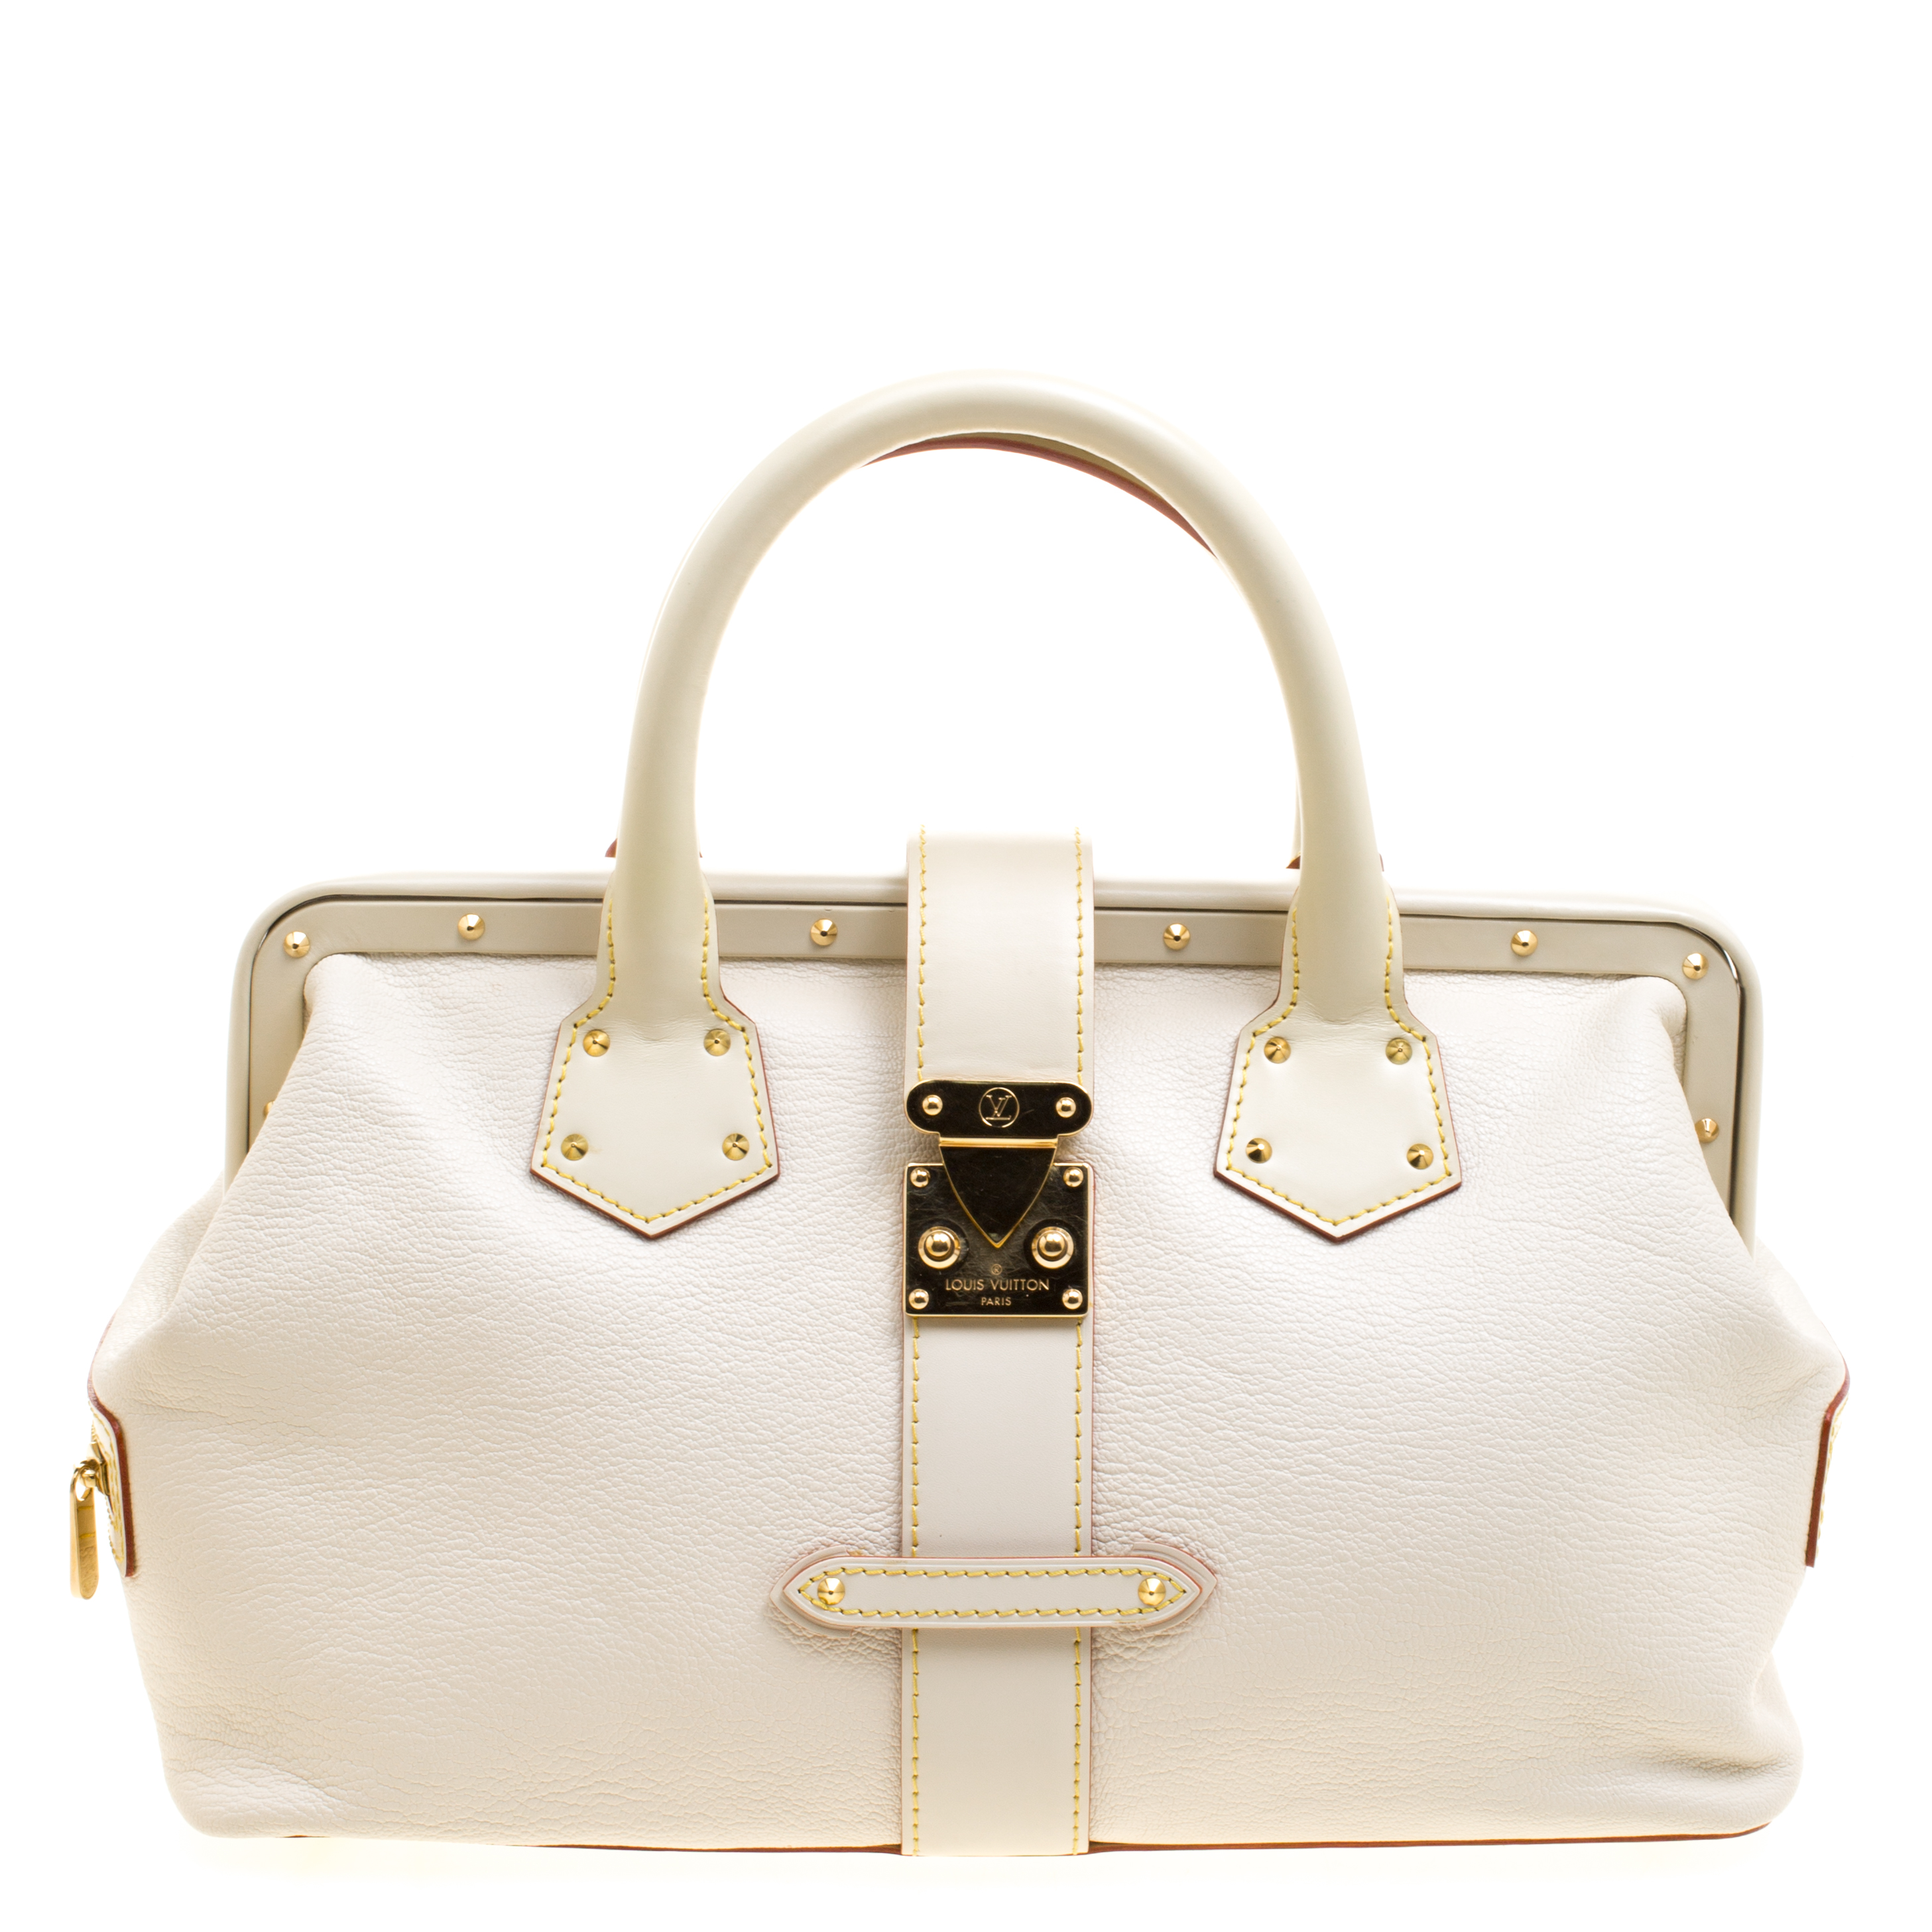 4adea17e8 Buy Louis Vuitton White Suhali Leather L'Ingenieux PM Bag 118226 at ...